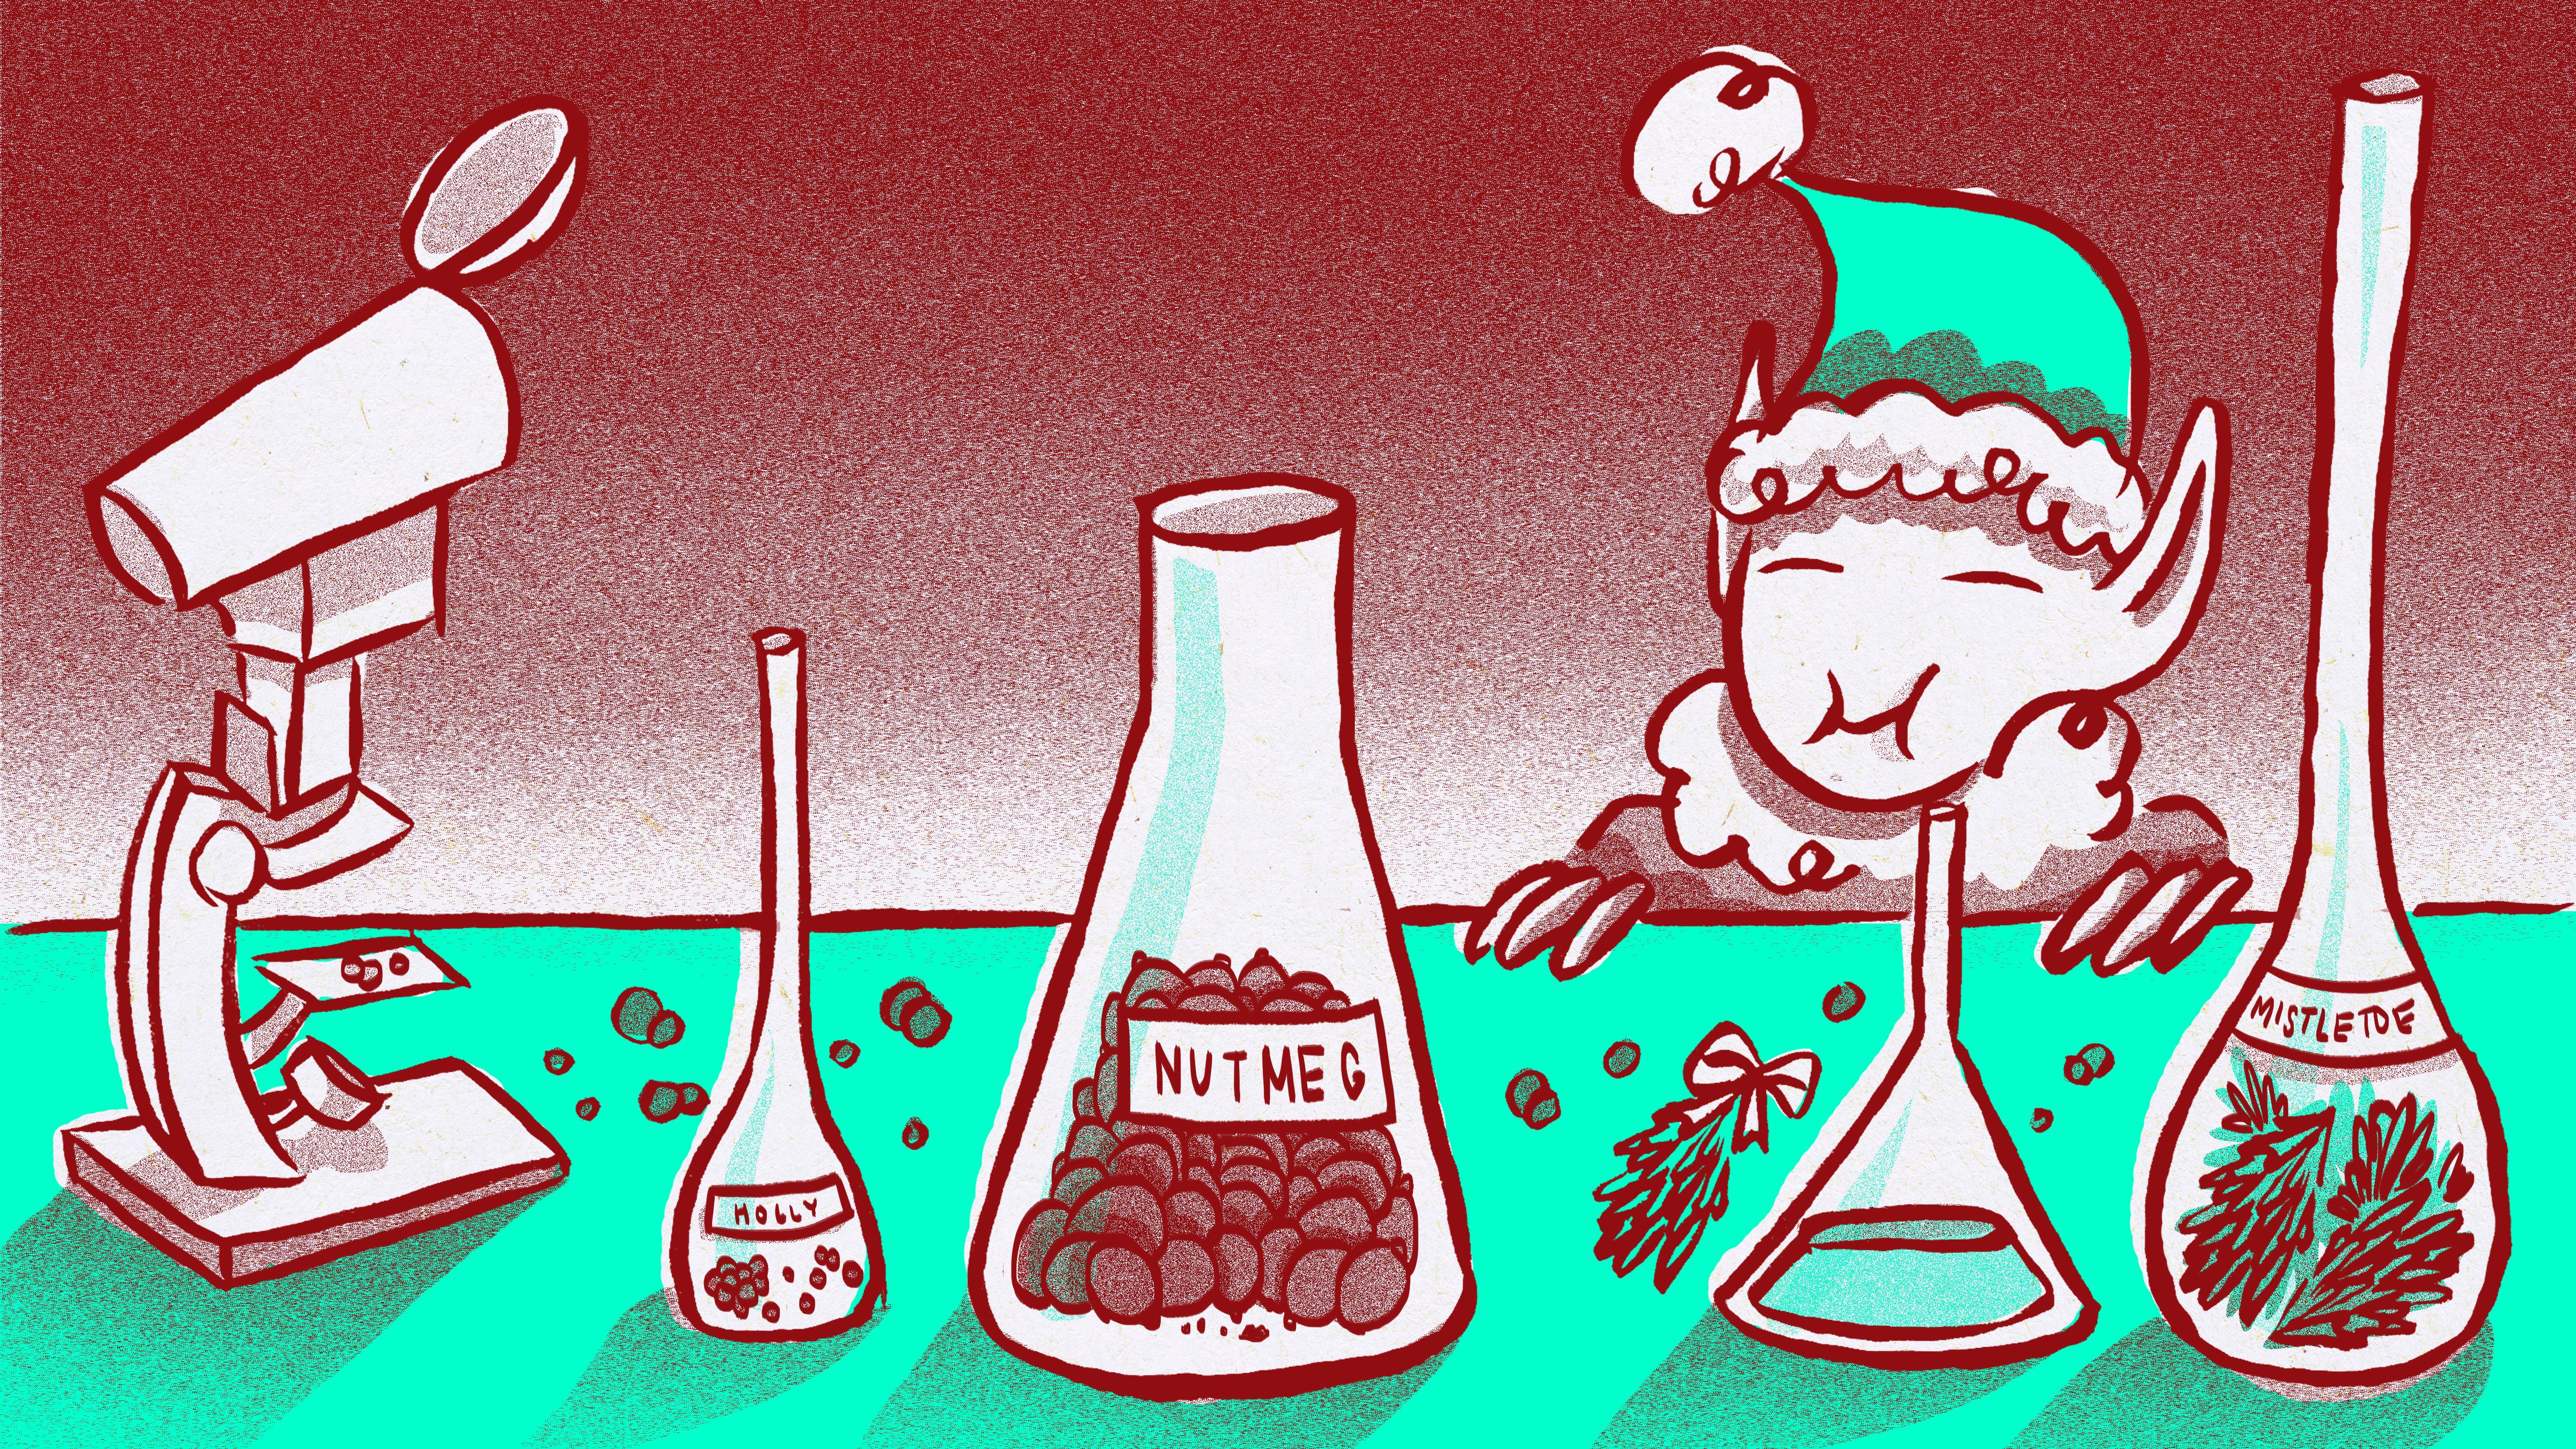 The Healing Power Of Christmas The Secret Benefits Of Mistletoe